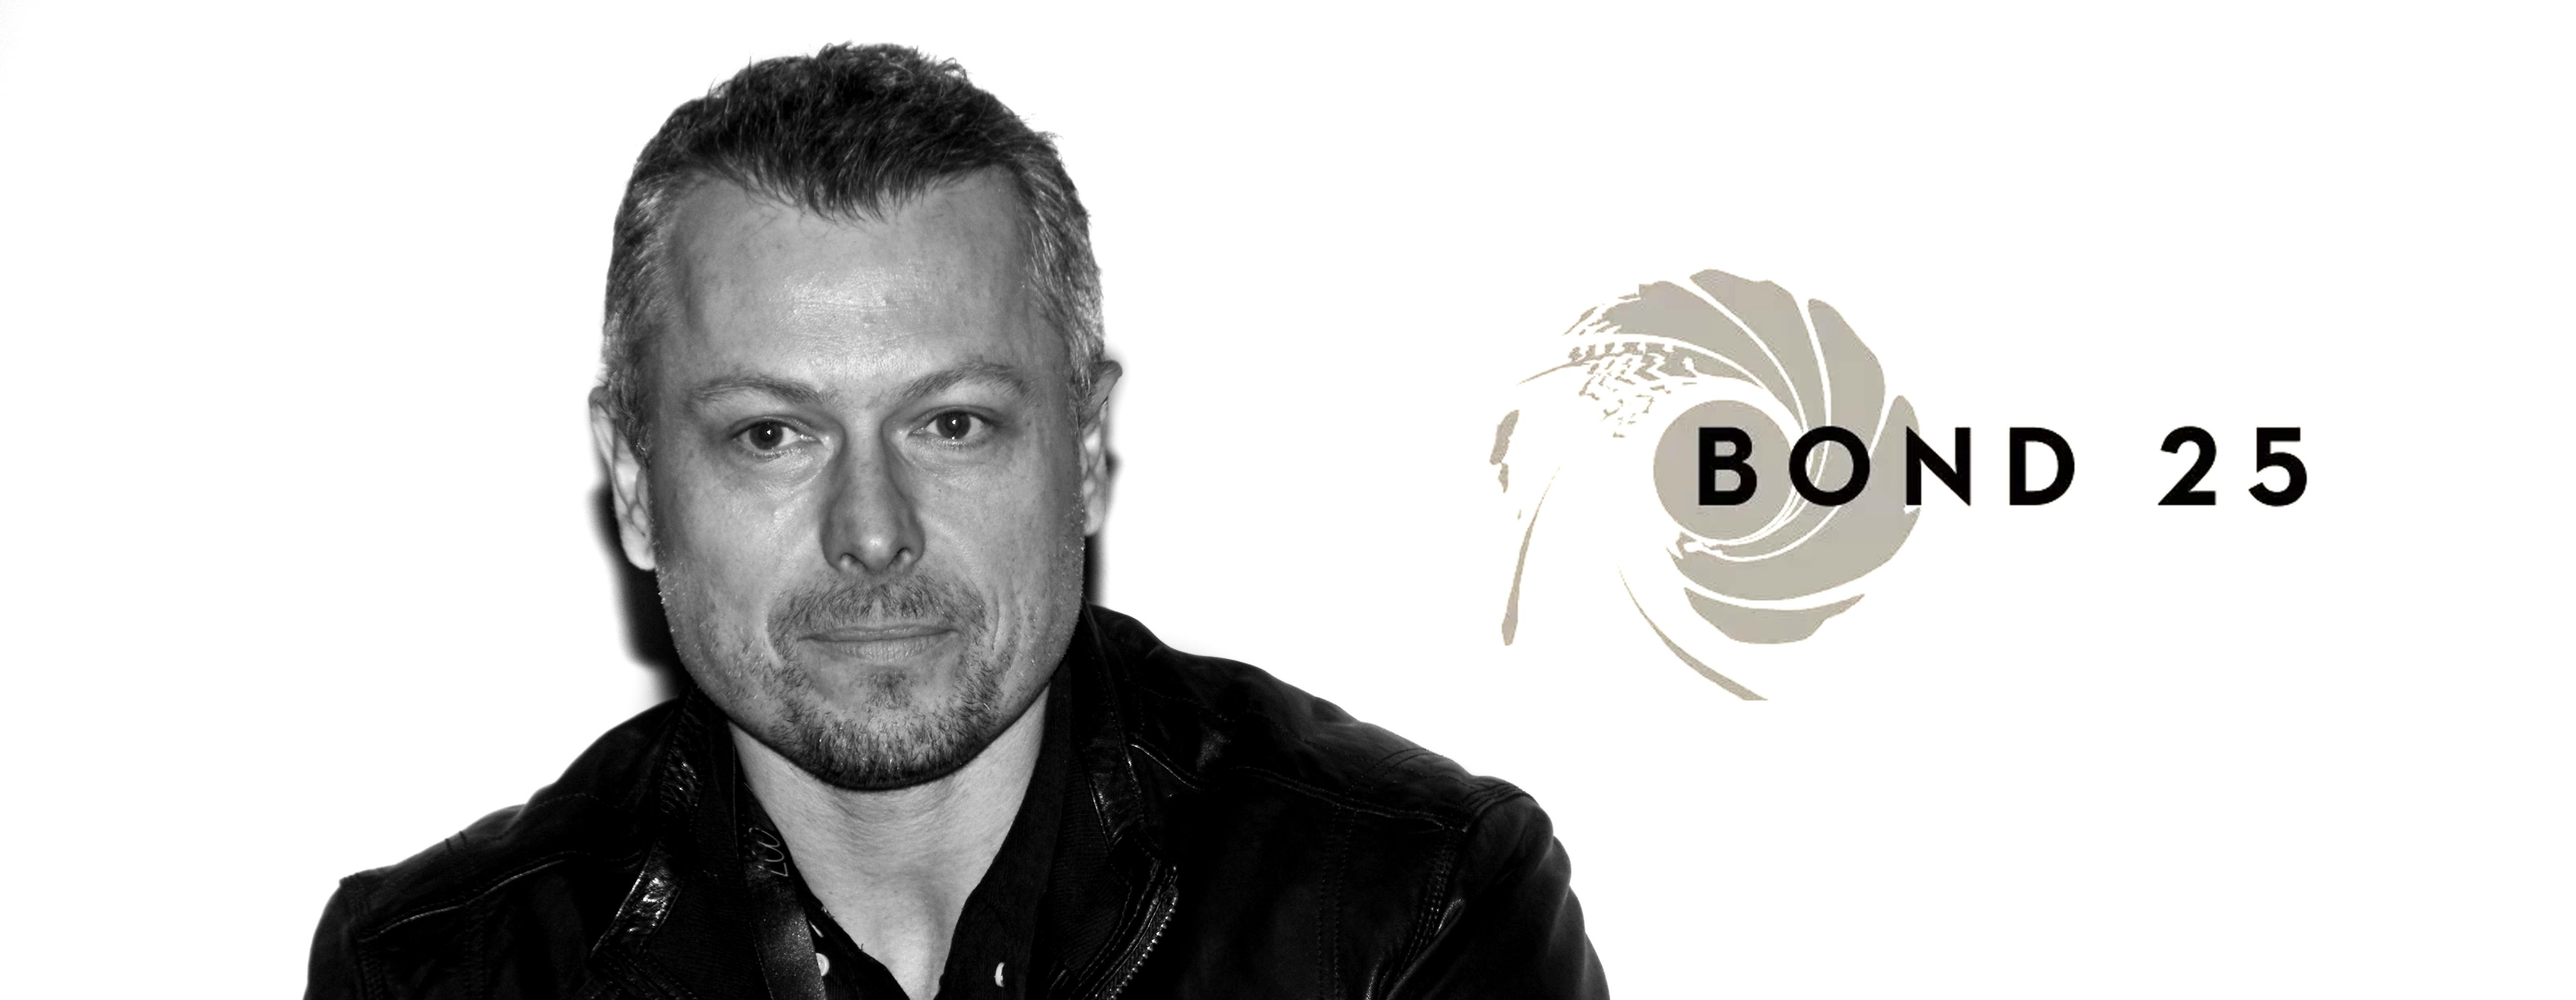 Olivier Schneider sera le Stunt Coordinator de BOND 25.